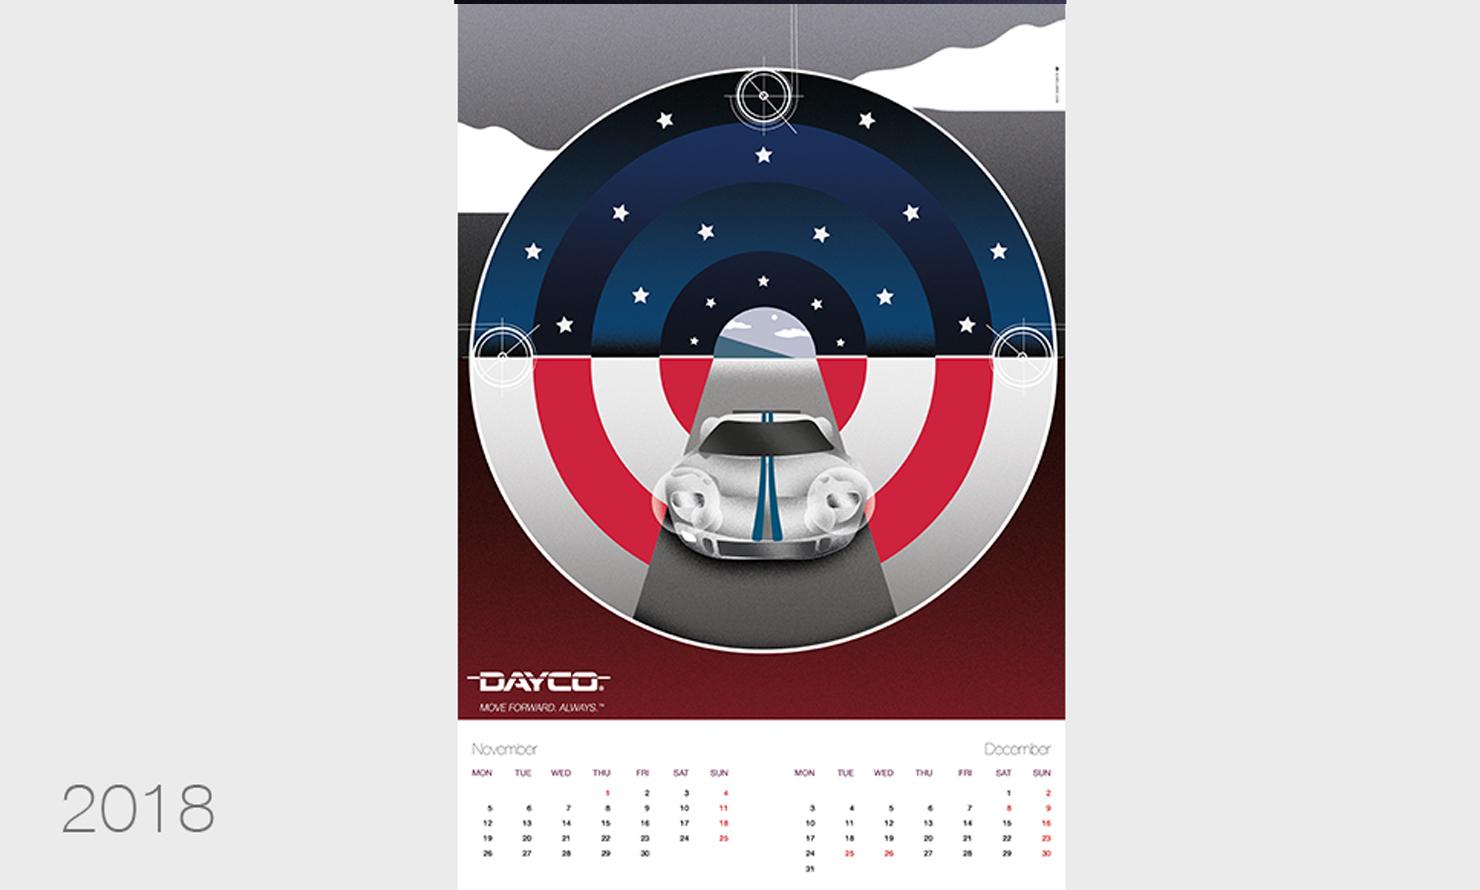 https://www.kubelibre.com/uploads/Slider-work-tutti-clienti/dayco-calendario-2018-6.jpg